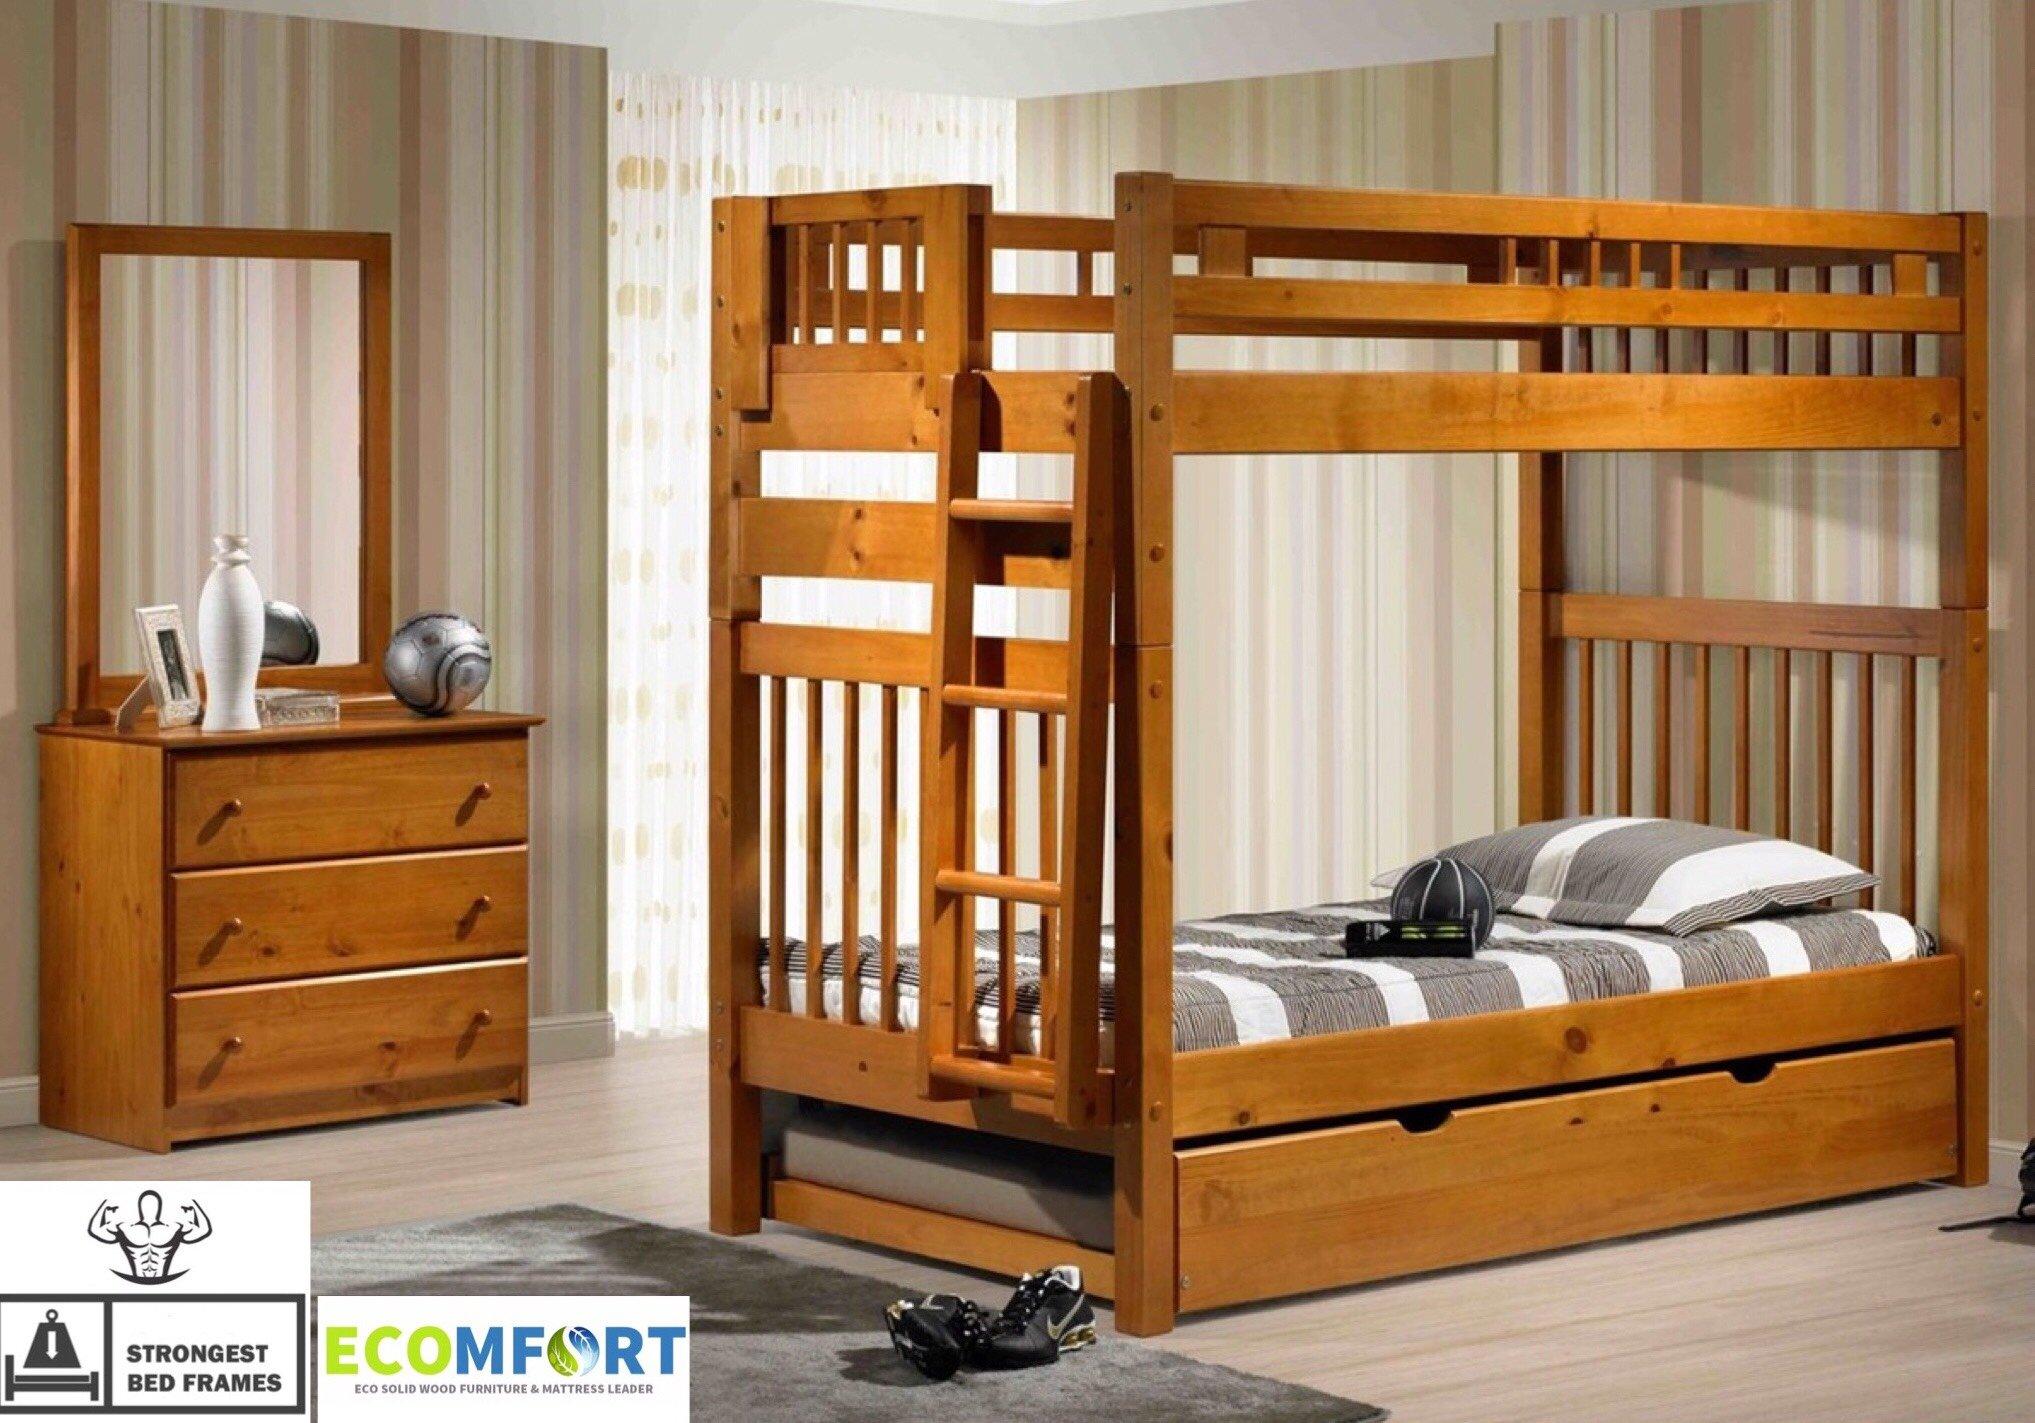 Platform Bedboston Solid Wood Bunk Bed Pecanbunk Bedboston Solid Wood Bunk Bed Pecanmattressboston Solid Wood Bunk Bed Pecanmemory Foamboston Solid Wood Bunk Bed Pecanpillowboston Solid Wood Bunk Bed